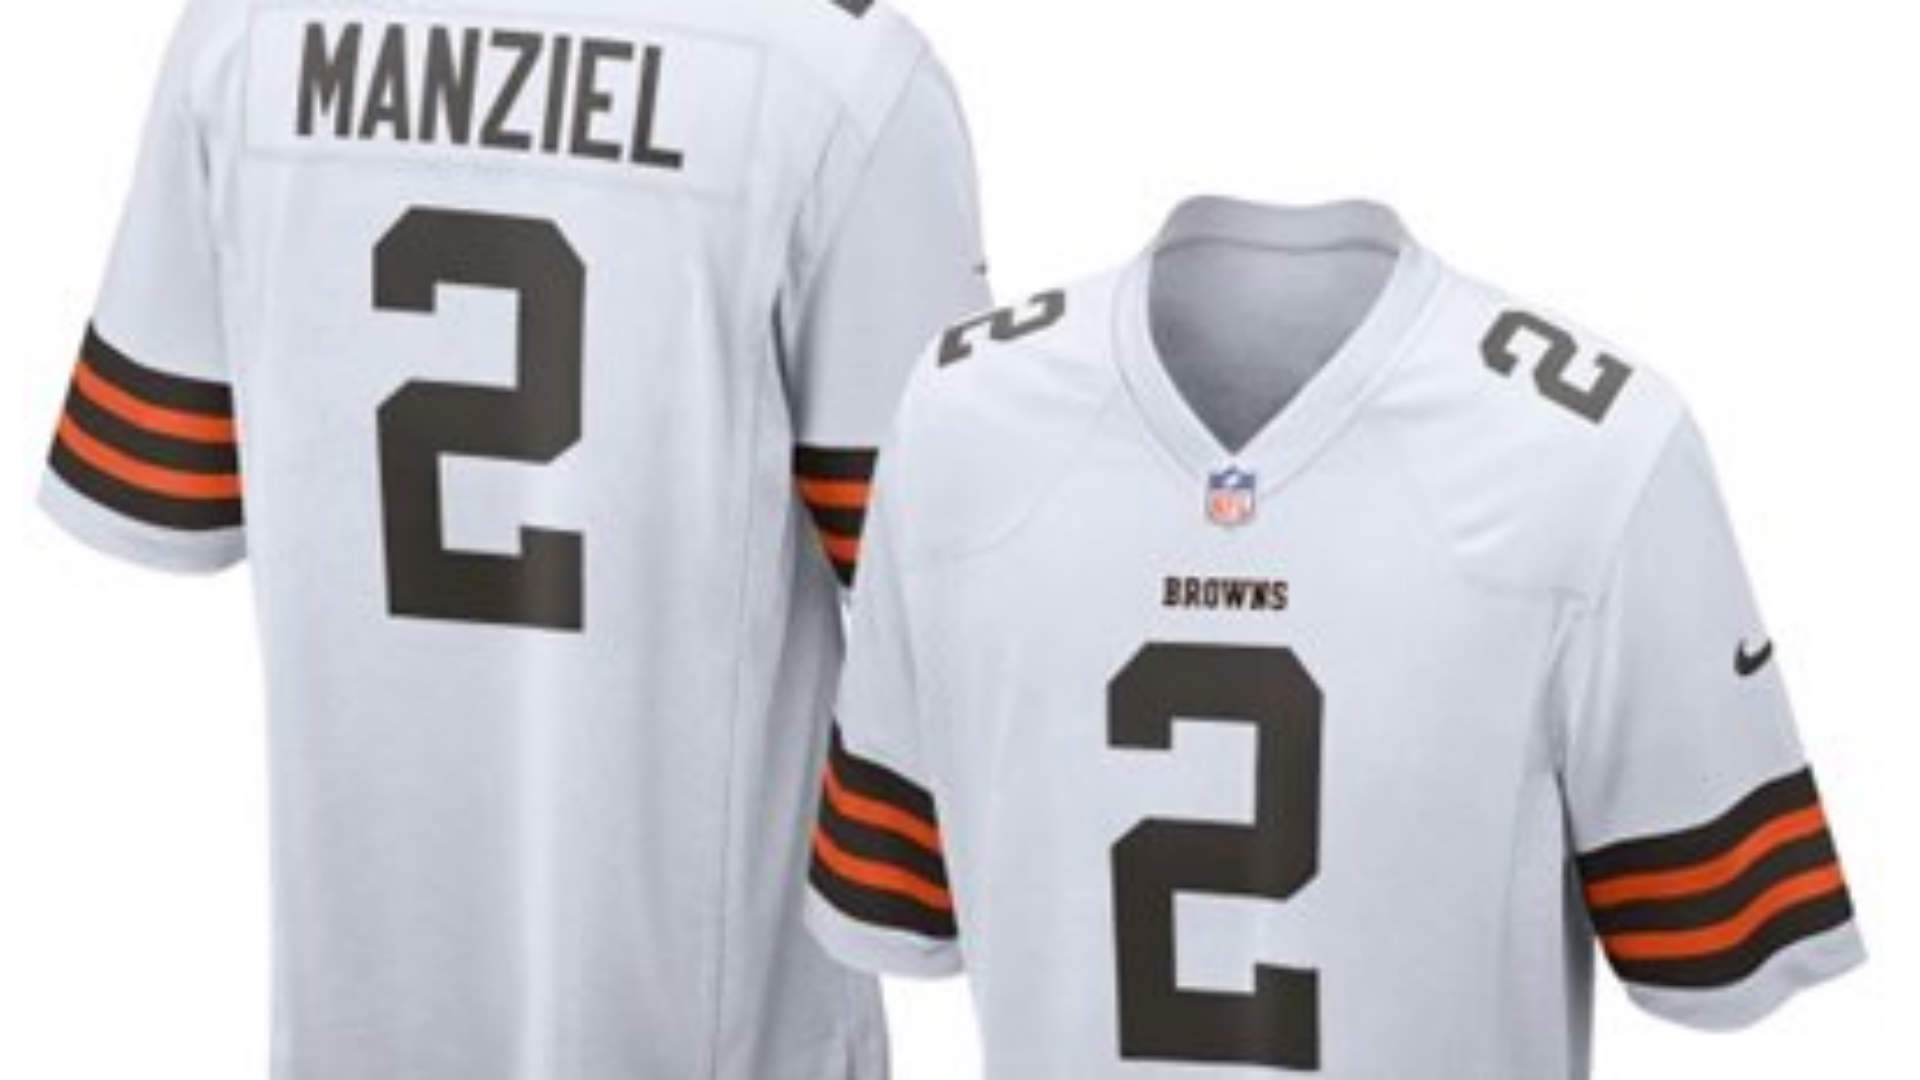 Johnny Manziel jersey-072114-NFL.com-FTR.jpg